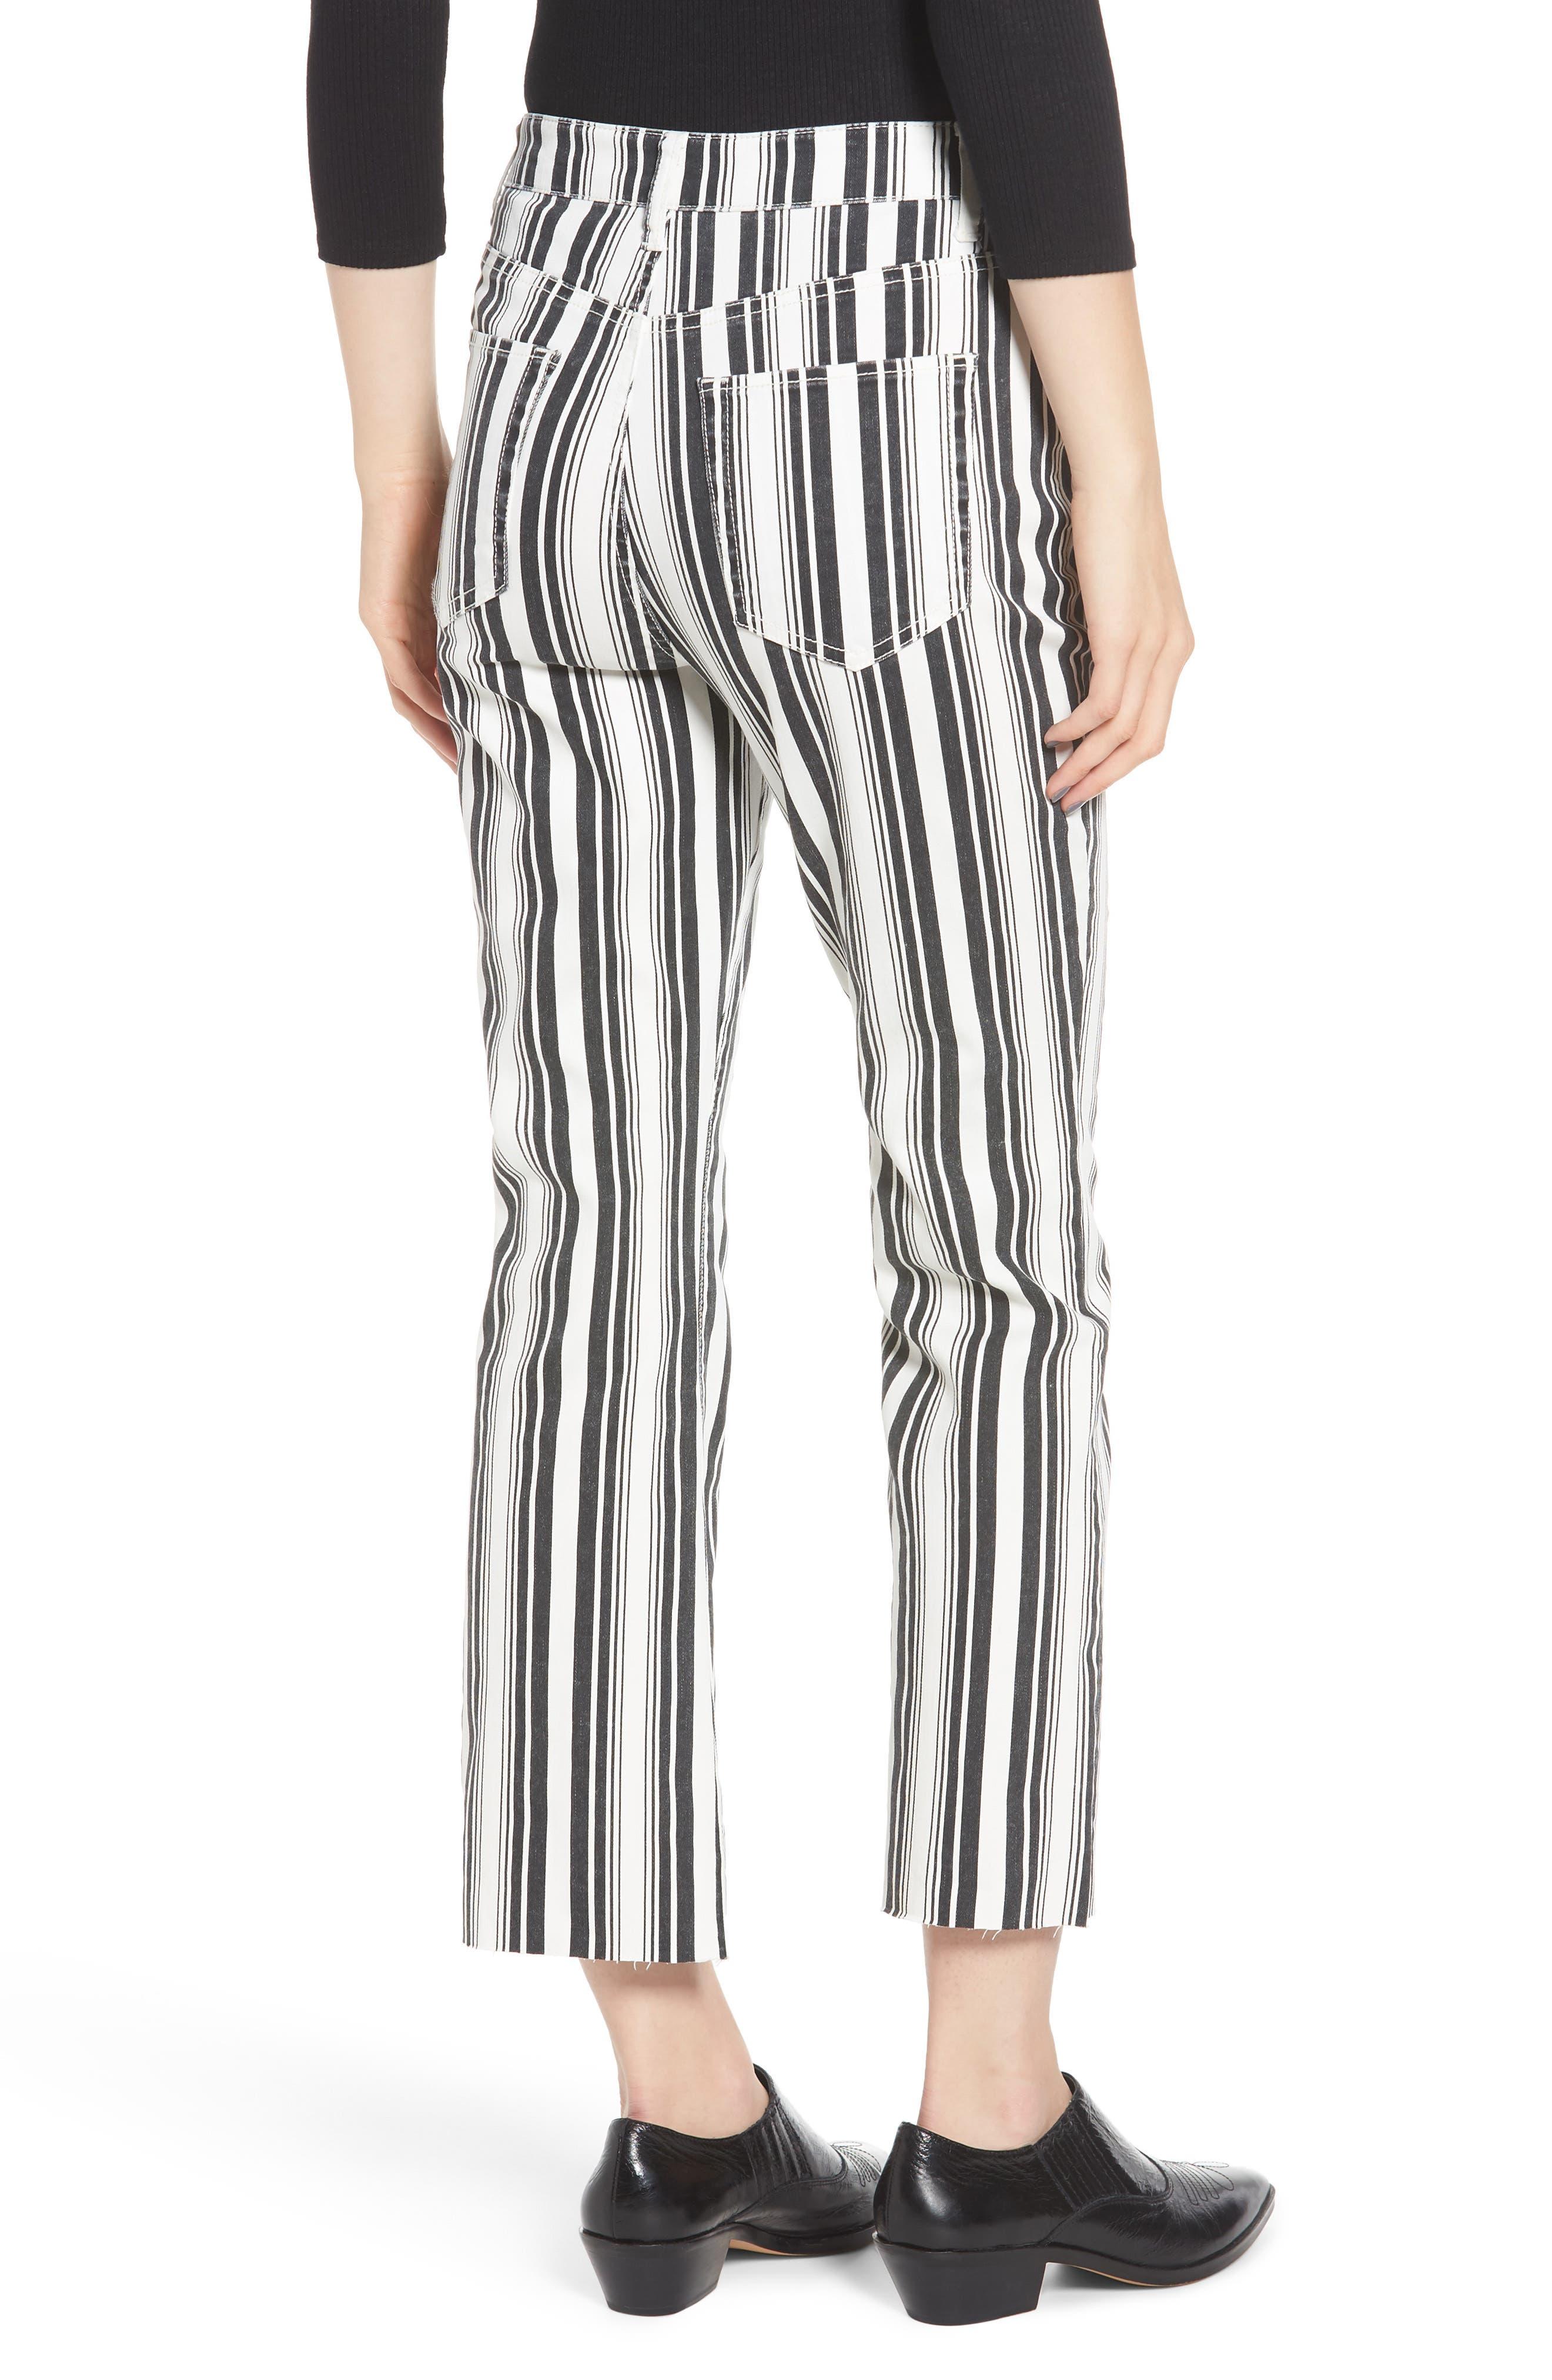 TINSEL, Stripe Crop Flare Jeans, Alternate thumbnail 2, color, WHITE BLACK